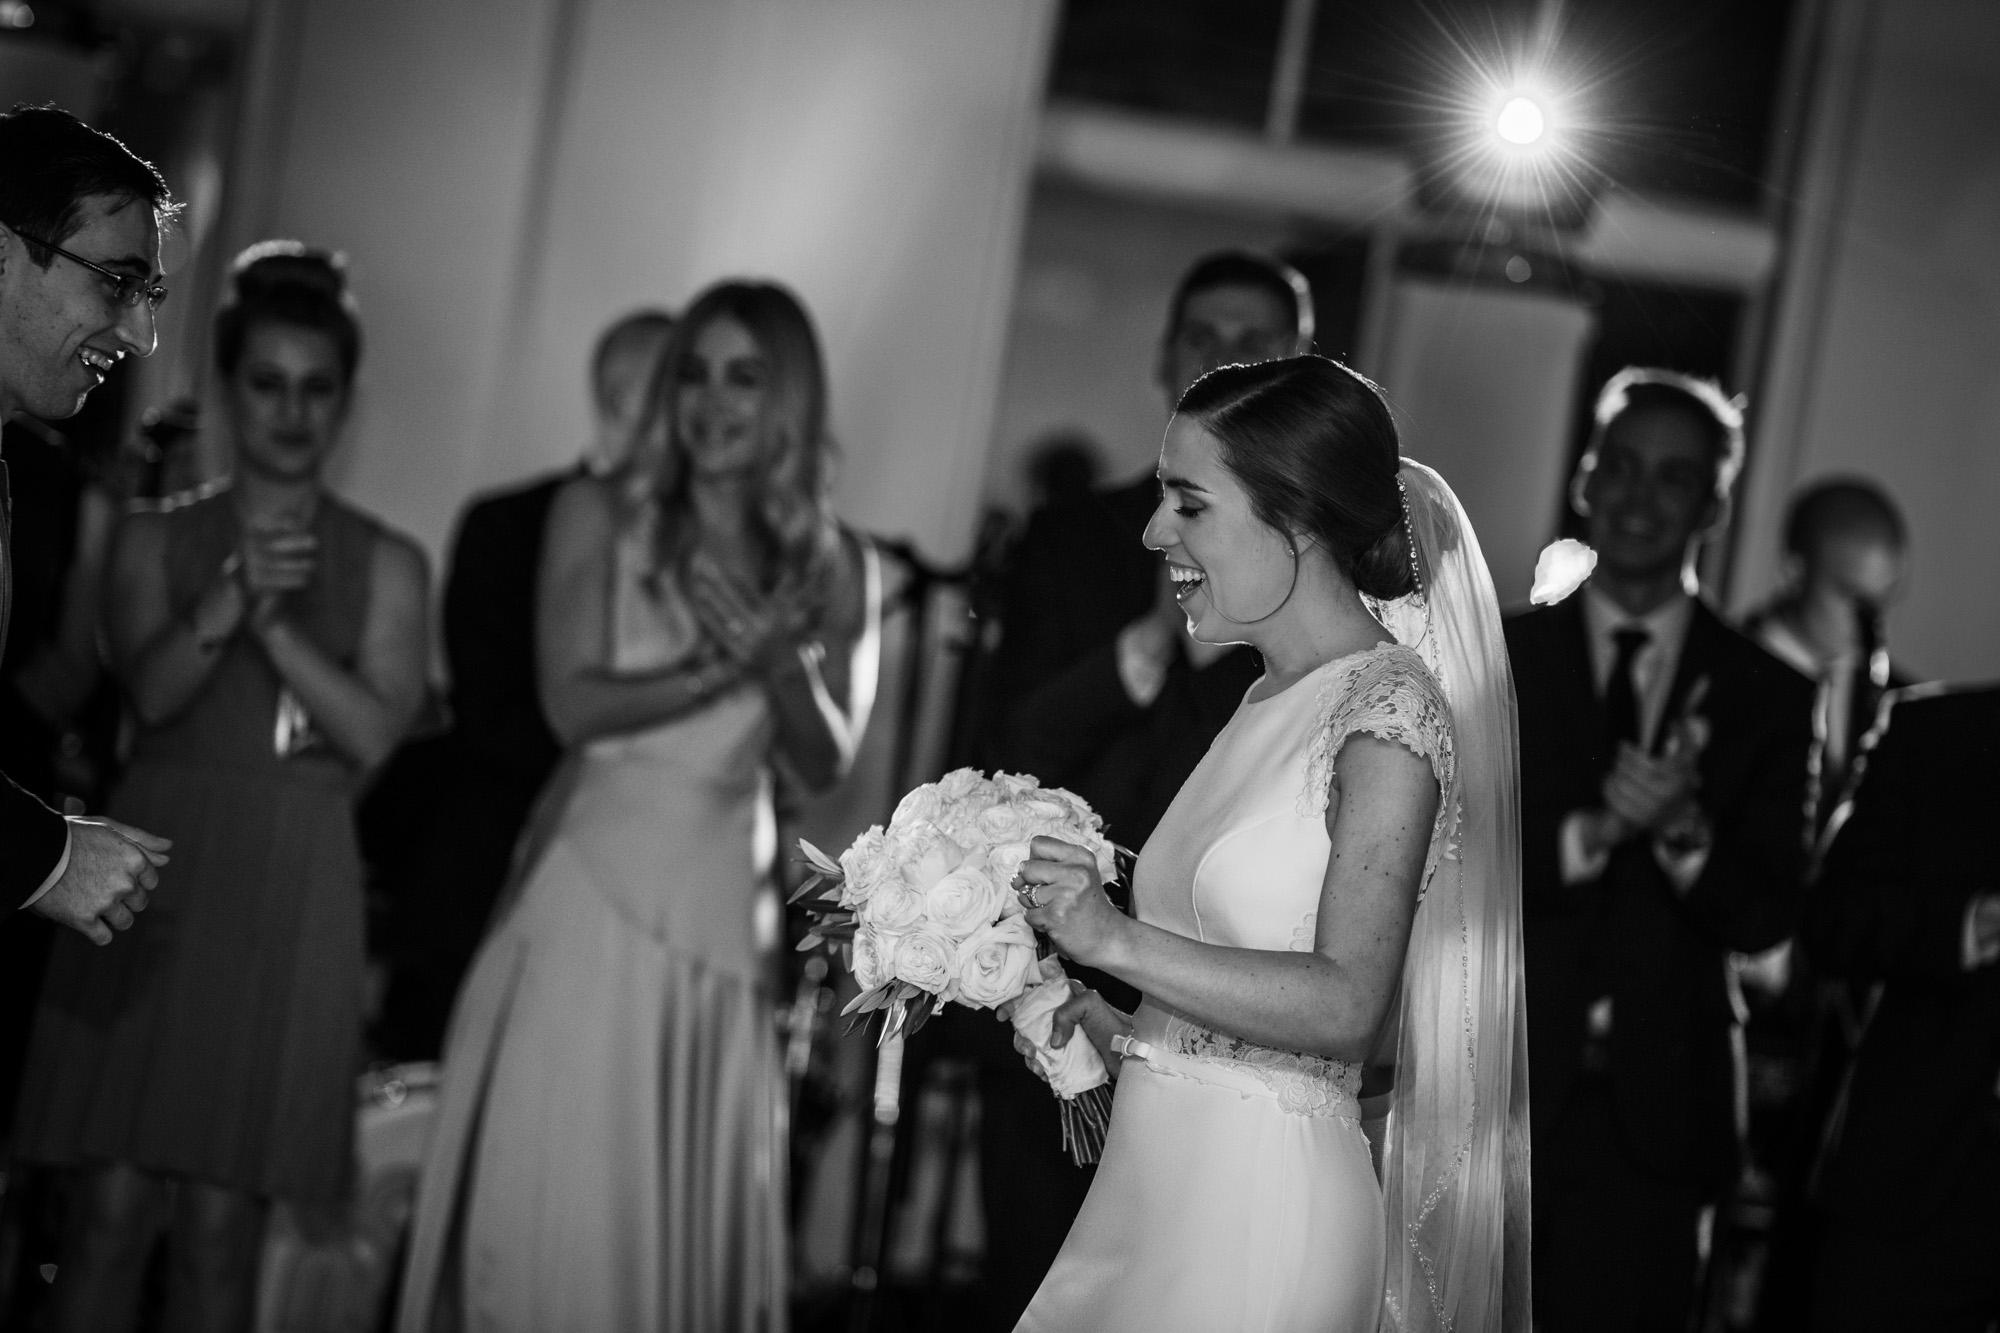 nj-wedding-photographer-maritime-parc-maria-david-44.jpg